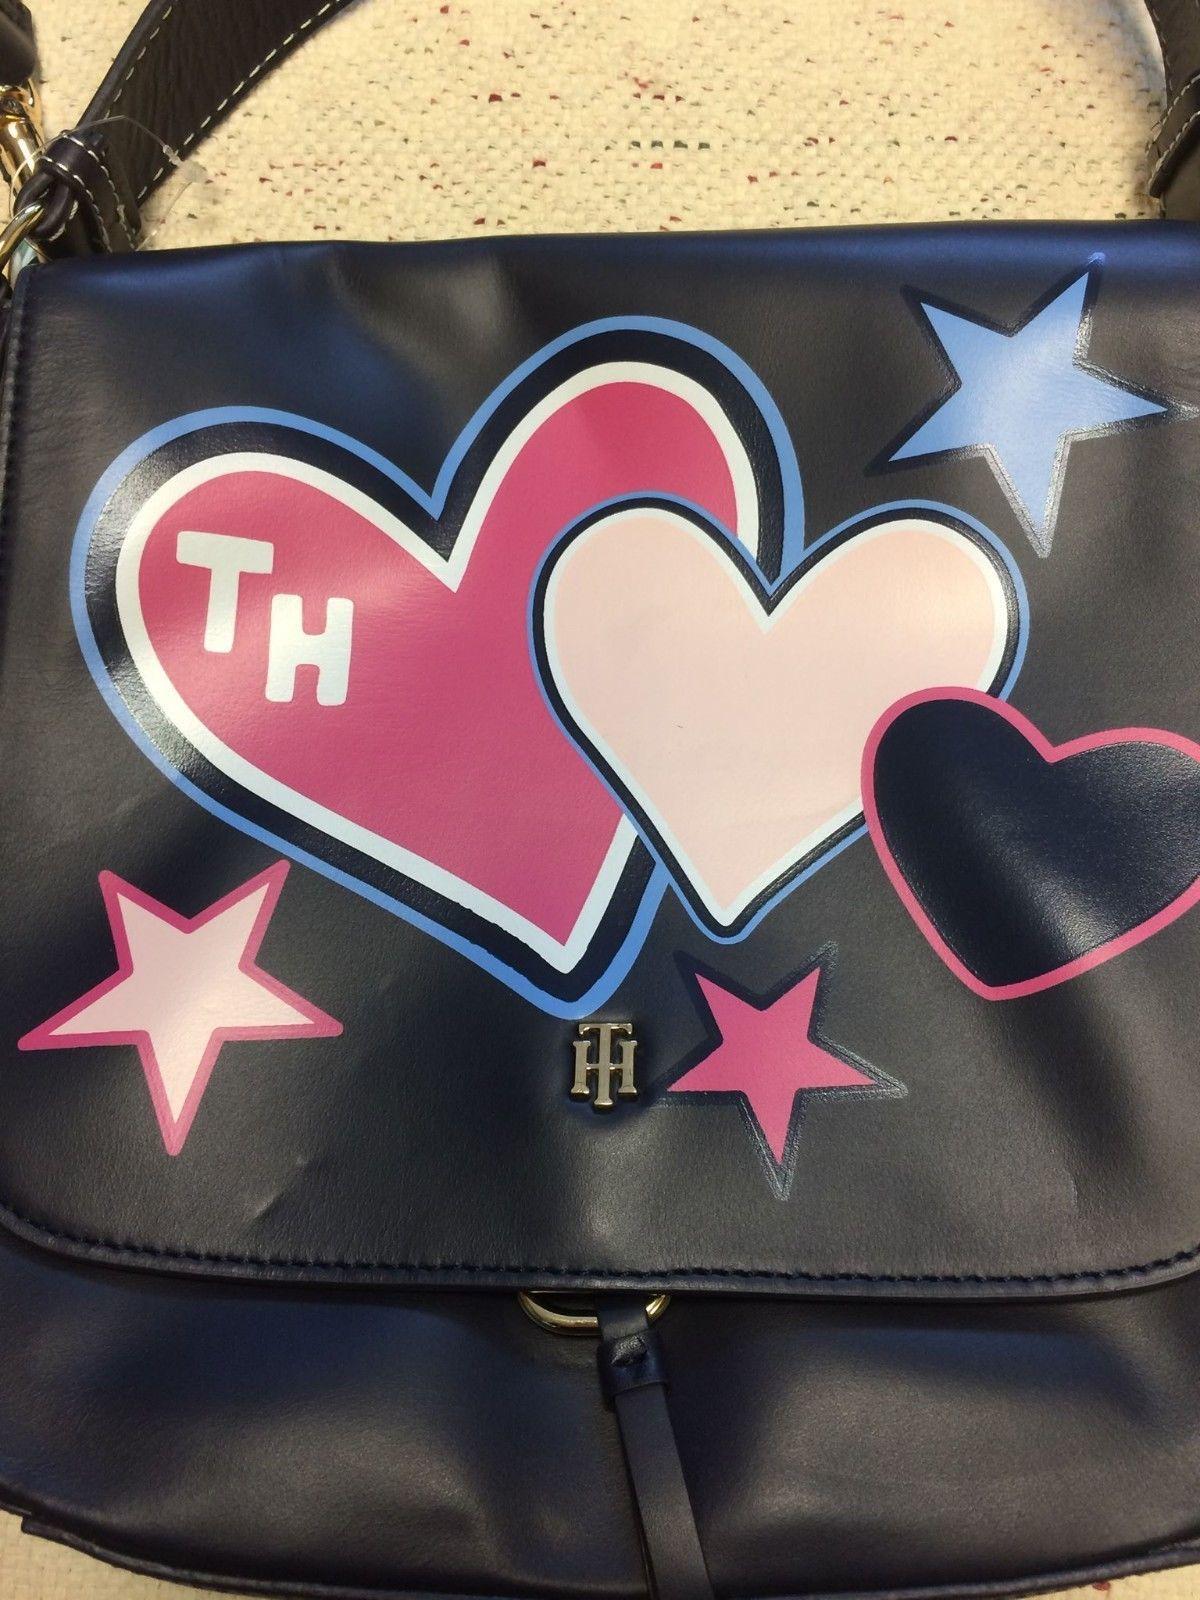 49b8cfd899d ... NWT Tommy Hilfiger Star Hearts Deboss Honey Leather Messenger Purse  Handbag $198 ...